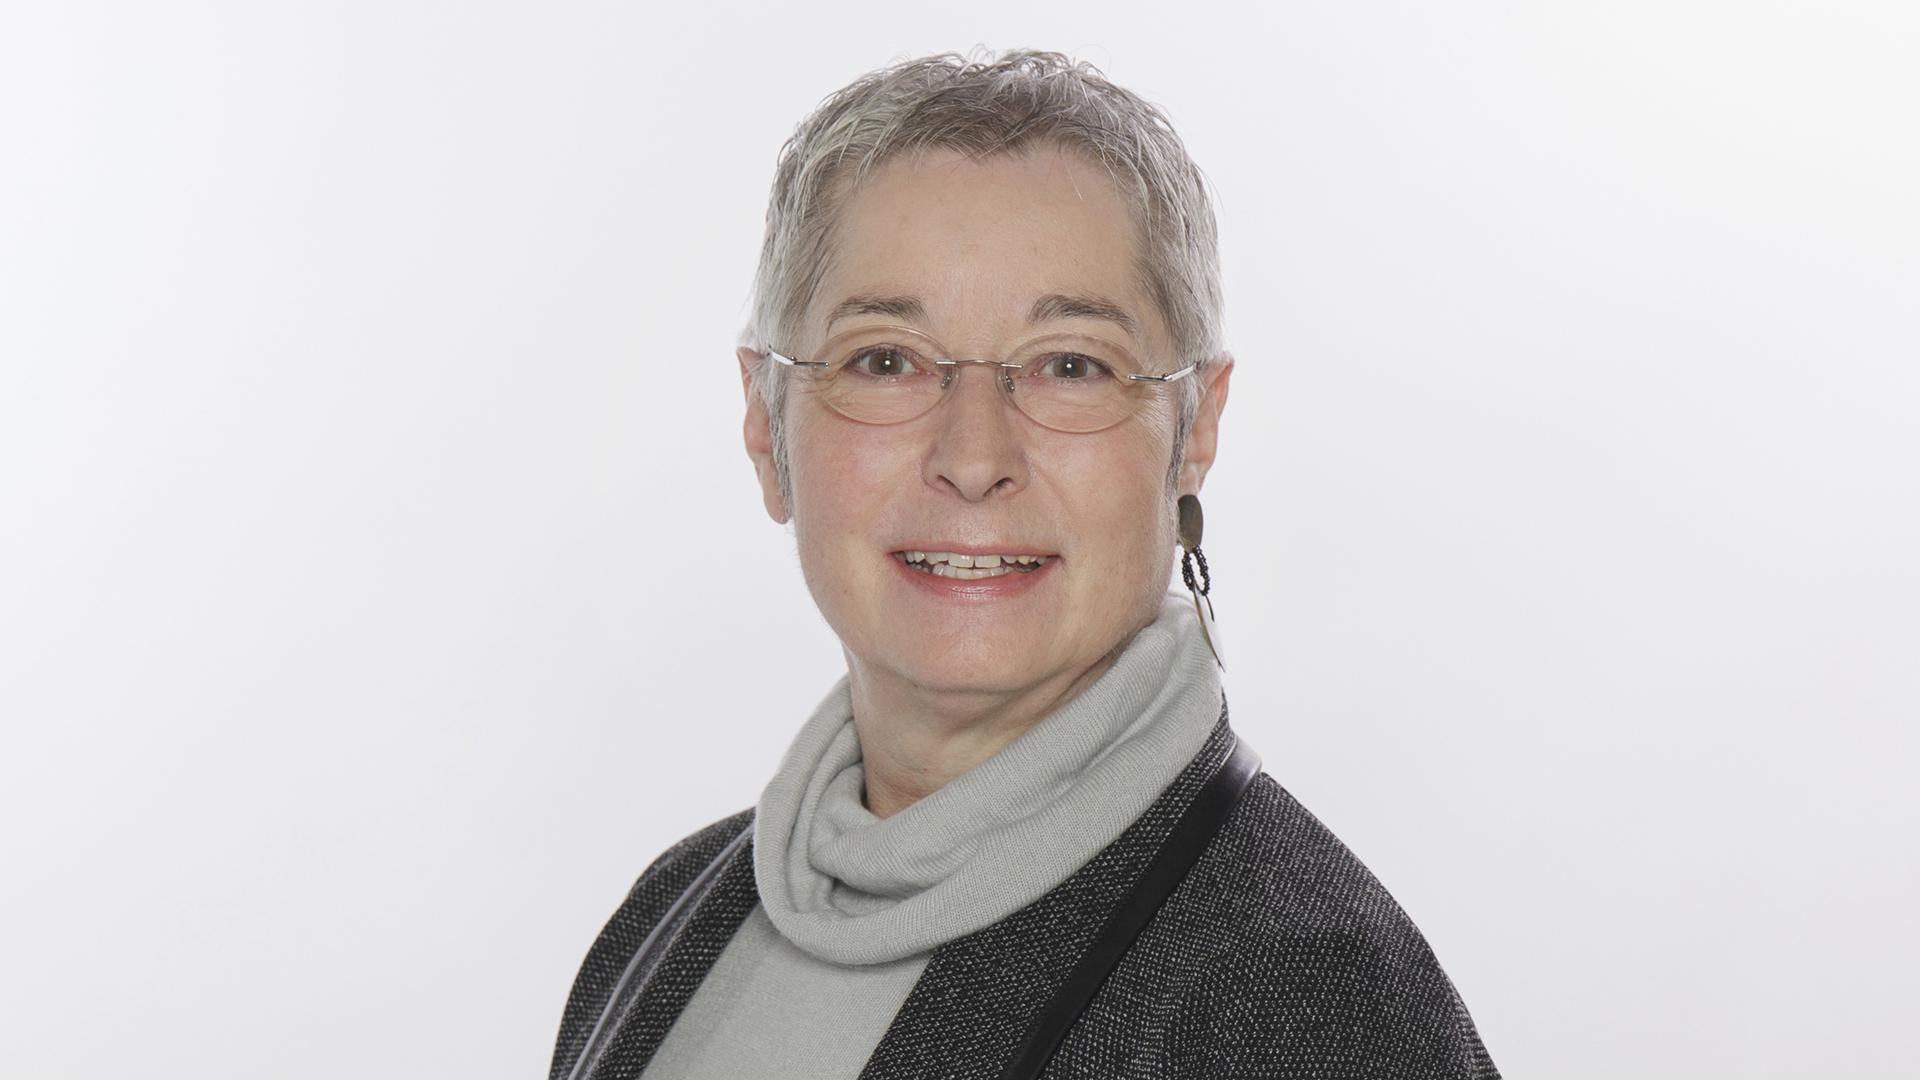 Ulrike Gondorf